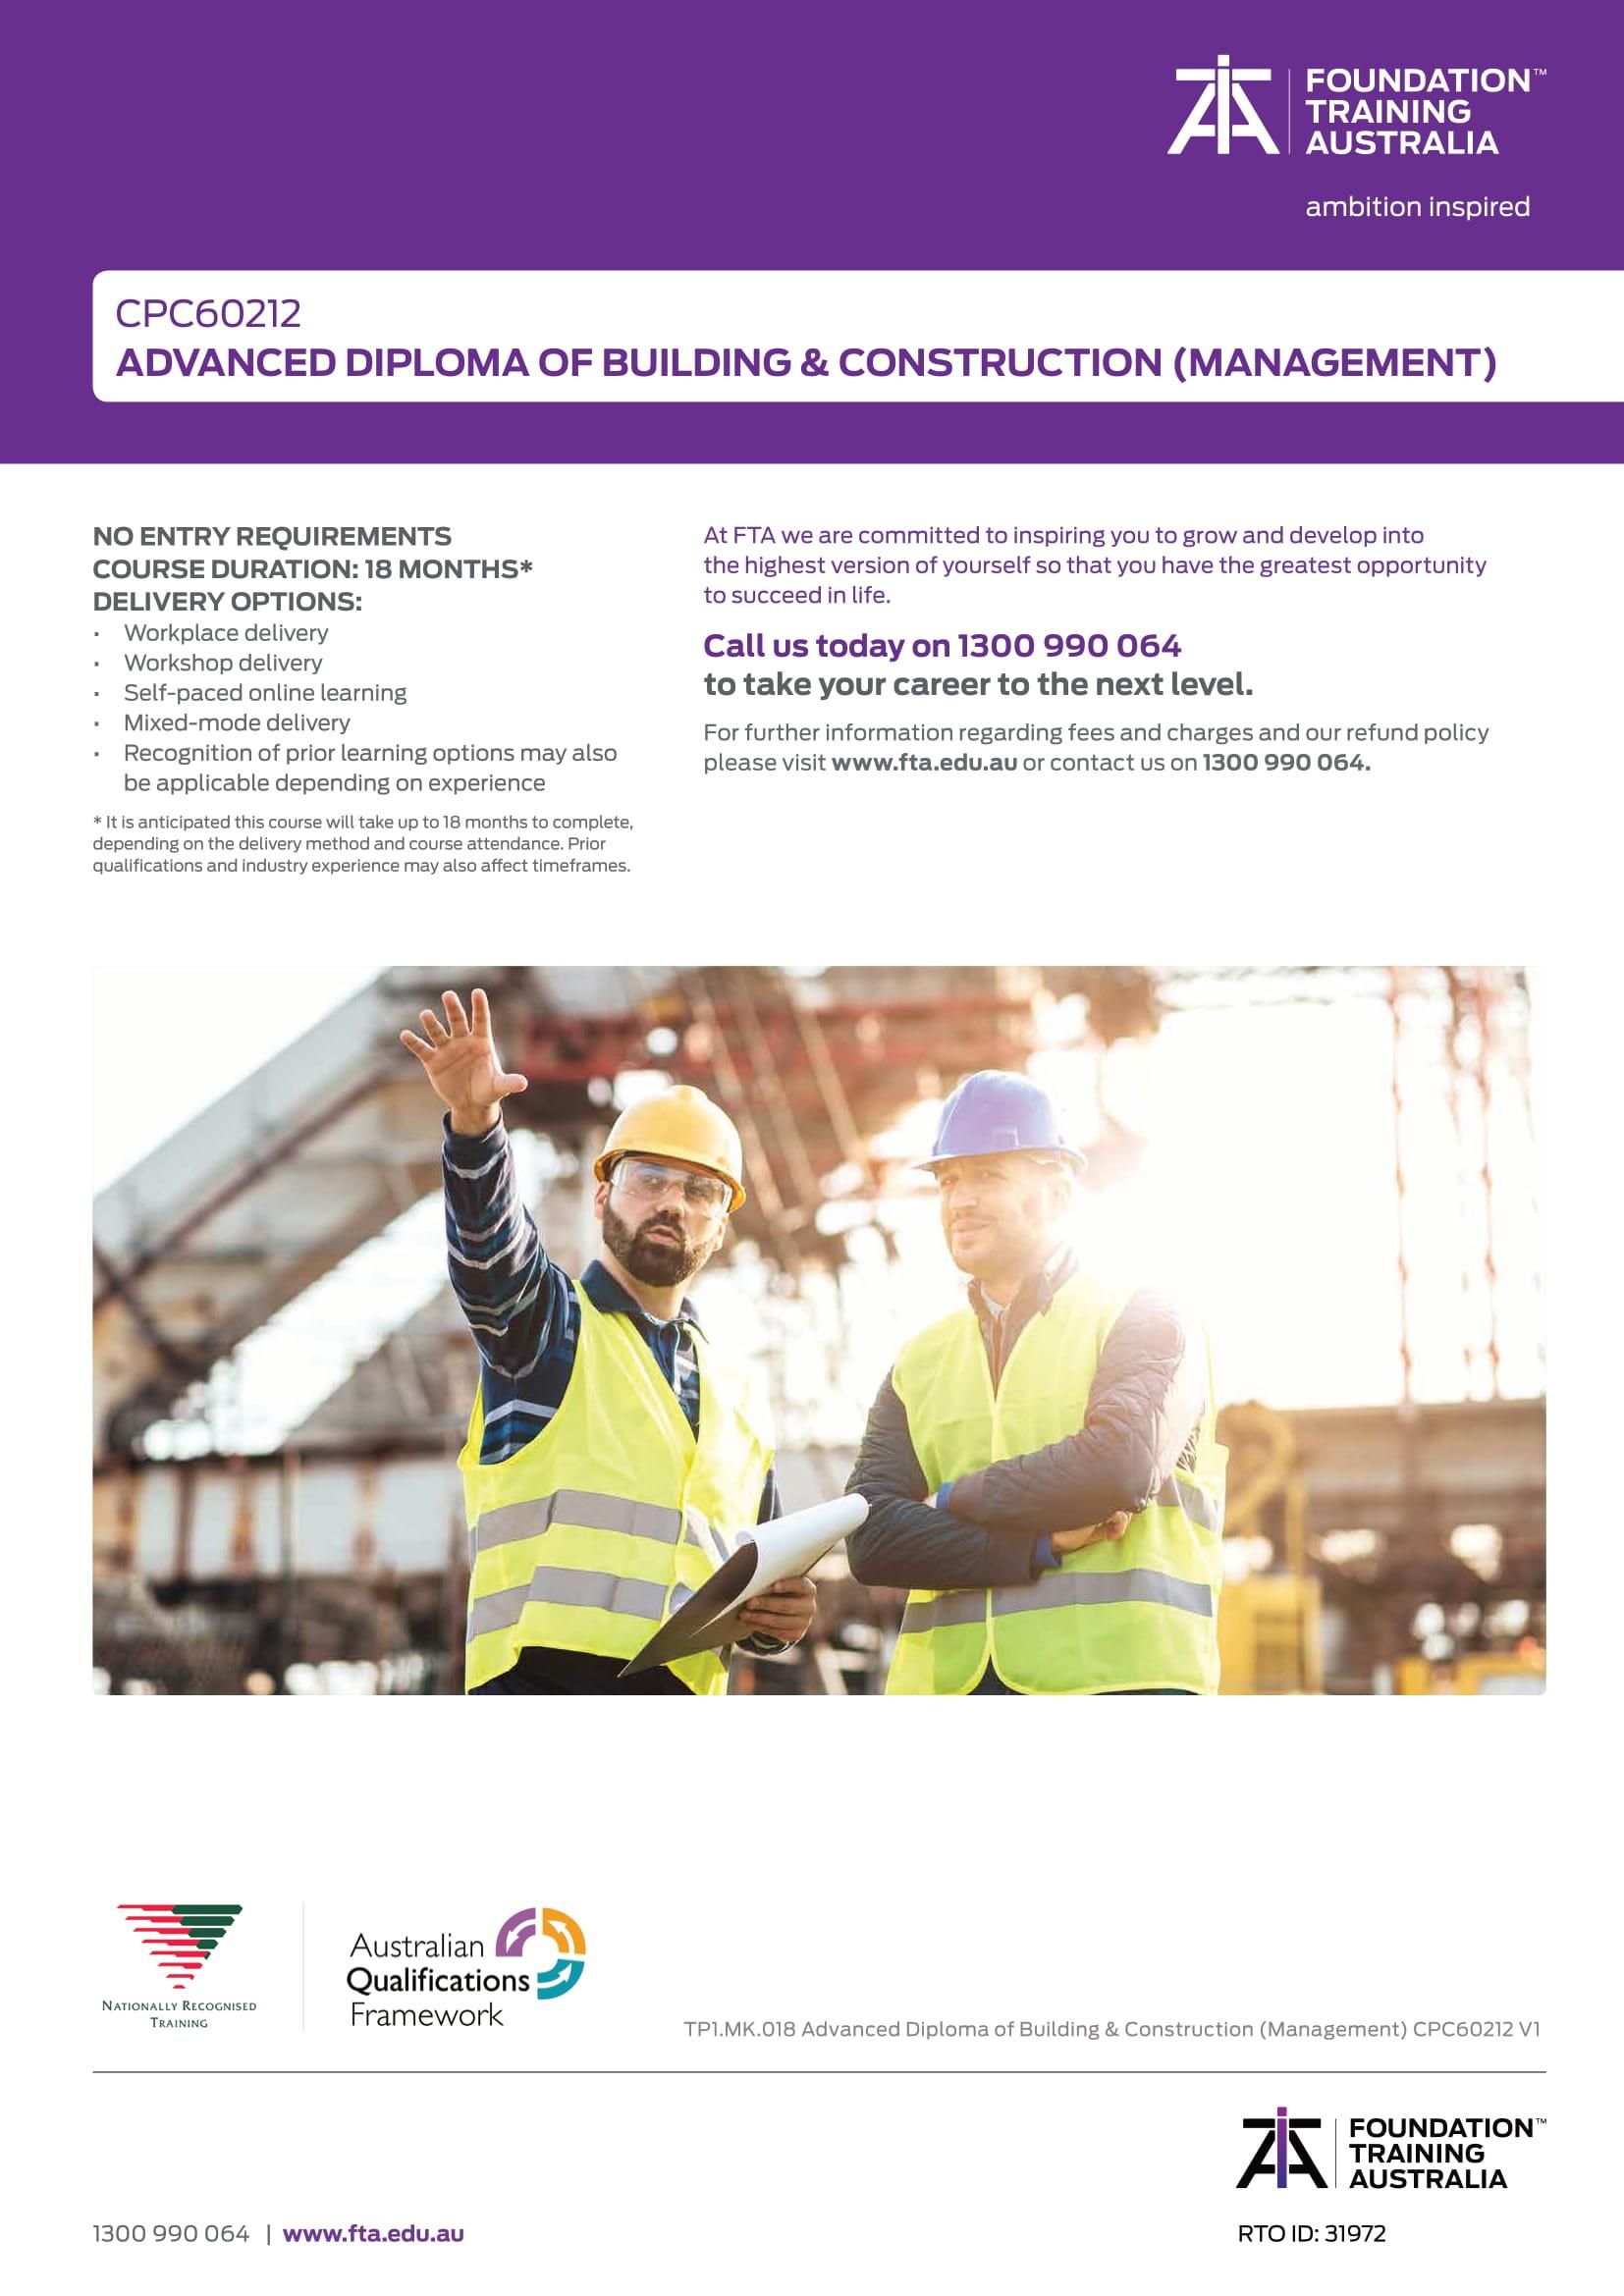 https://www.fta.edu.au/wp-content/uploads/2020/06/TP1.MK_.018-Advanced-Diploma-of-Building-Construction-Management-CPC60212-V1-DIGITAL-2.jpg